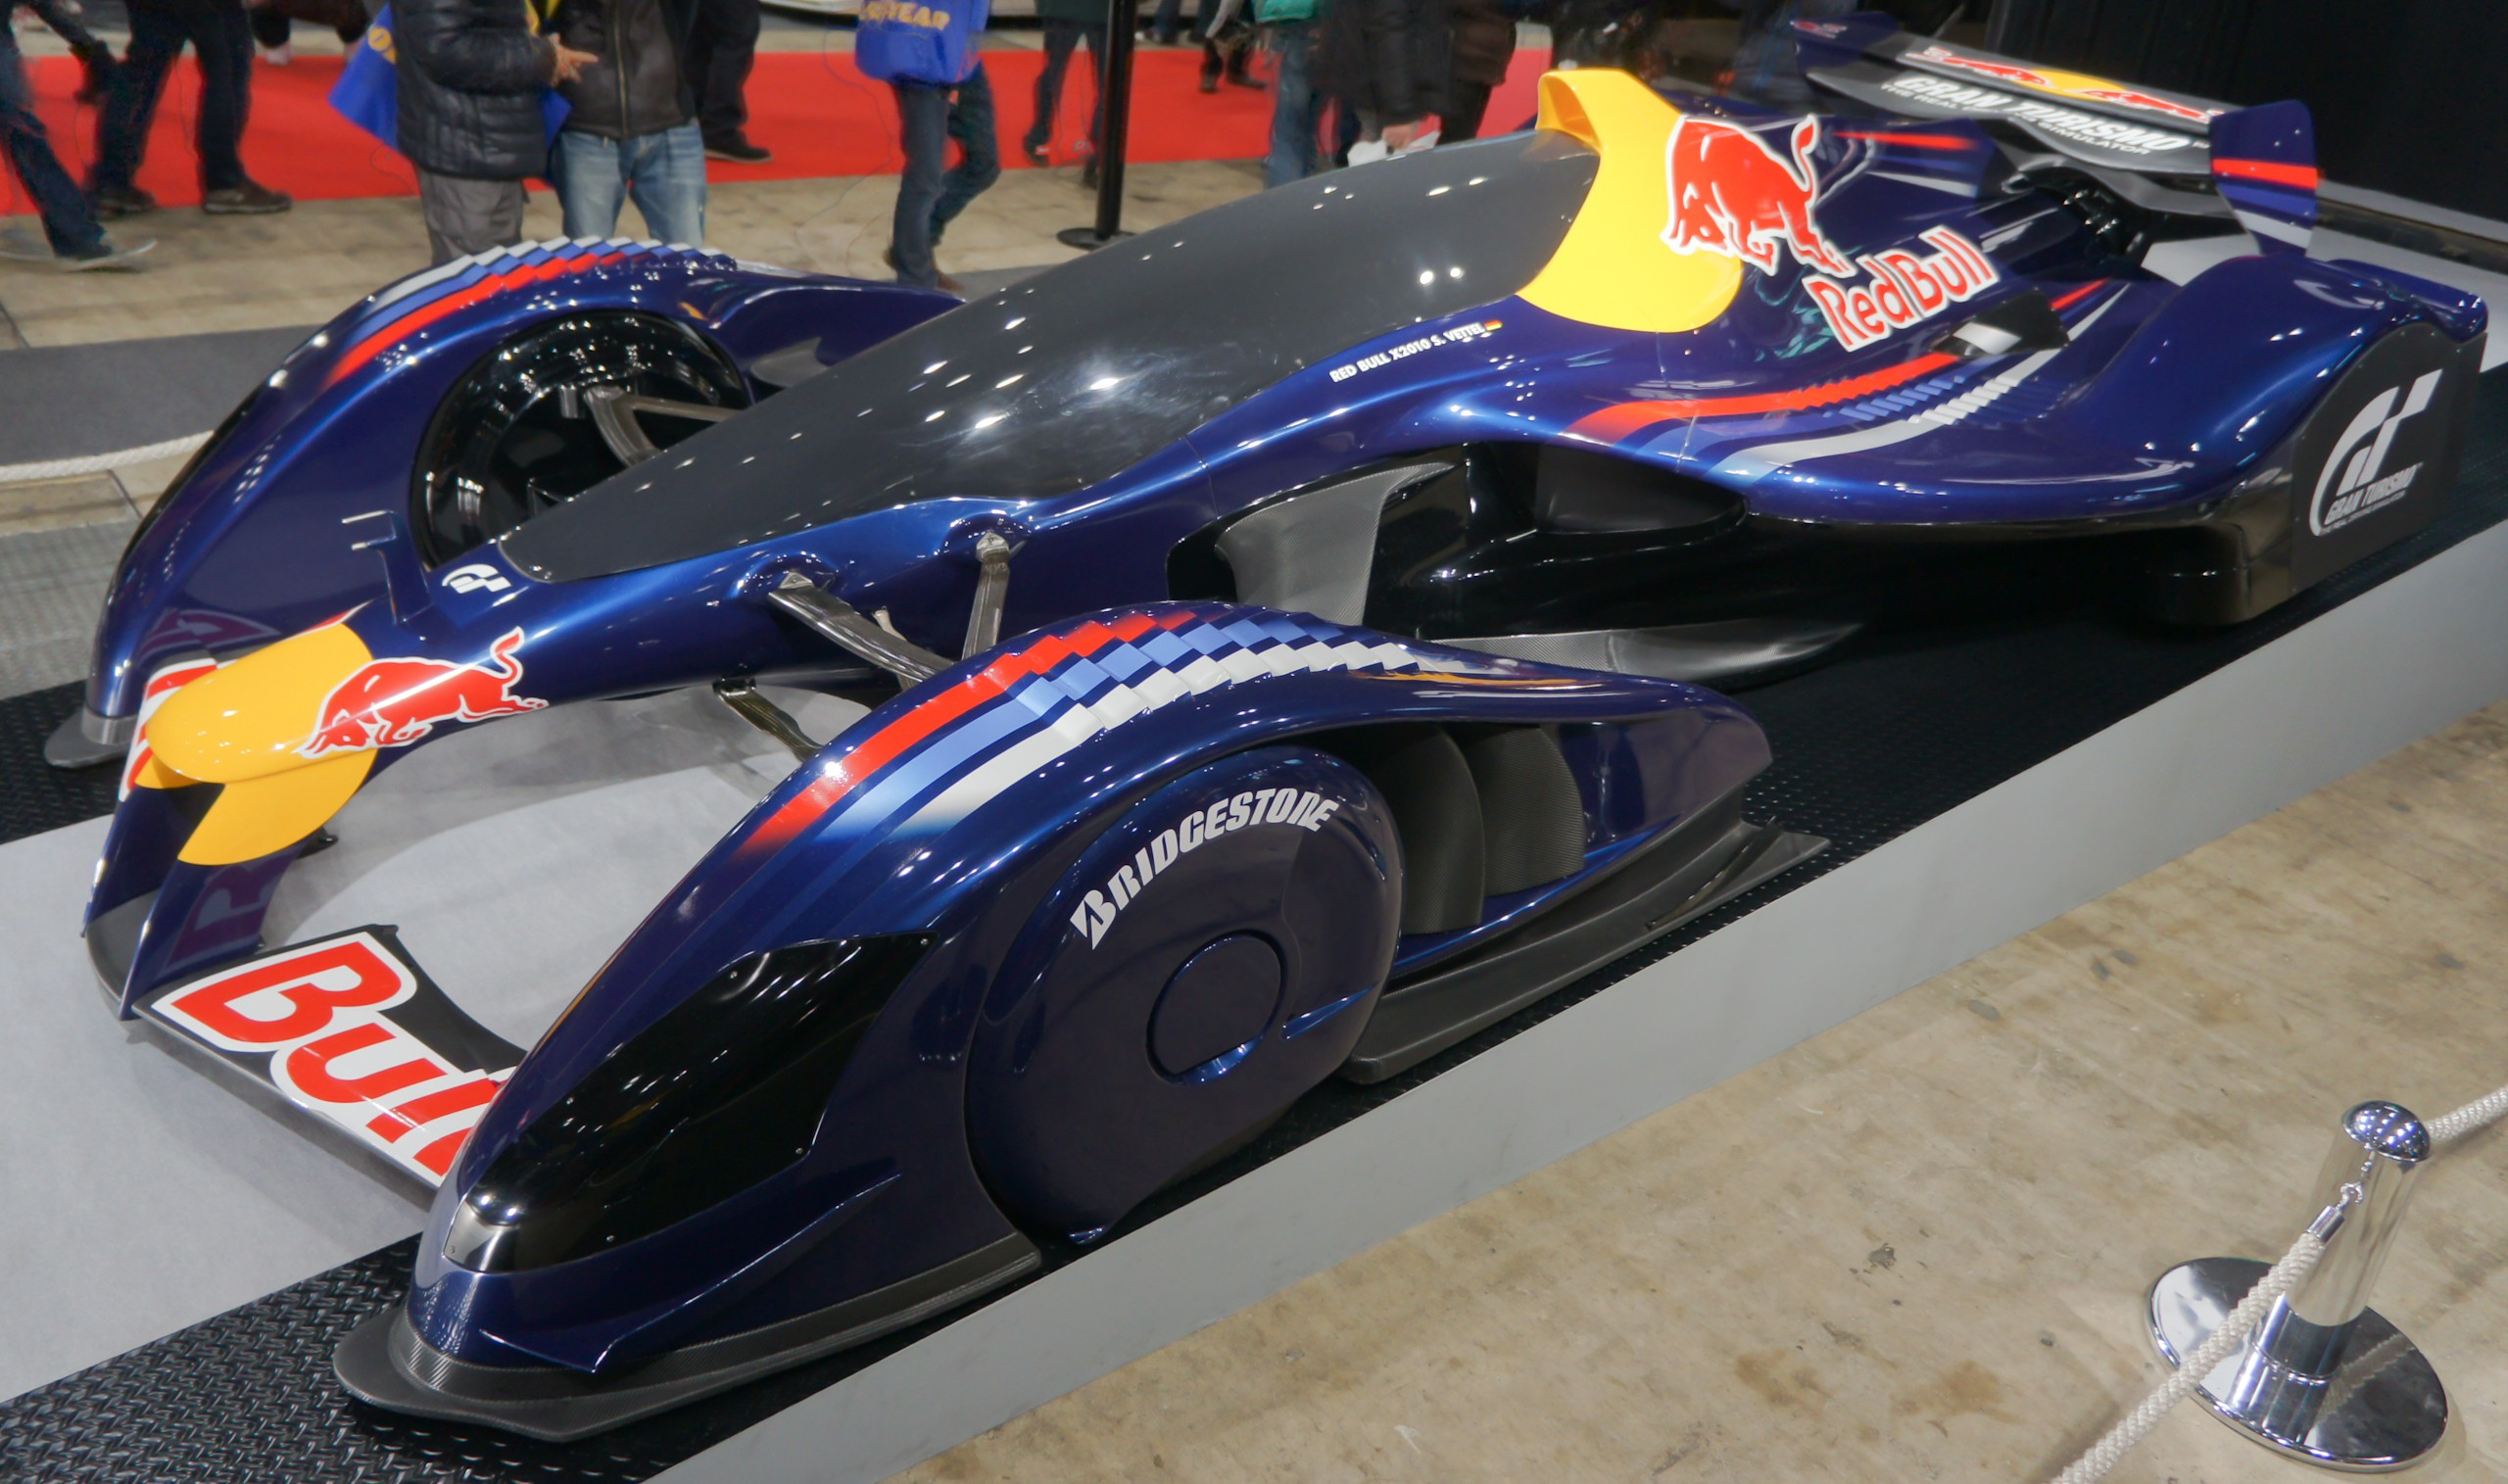 Red_Bull_X2010_highangle_2012_Tokyo_Auto_Salon Remarkable Lotus Carlton Gran Turismo 5 Cars Trend